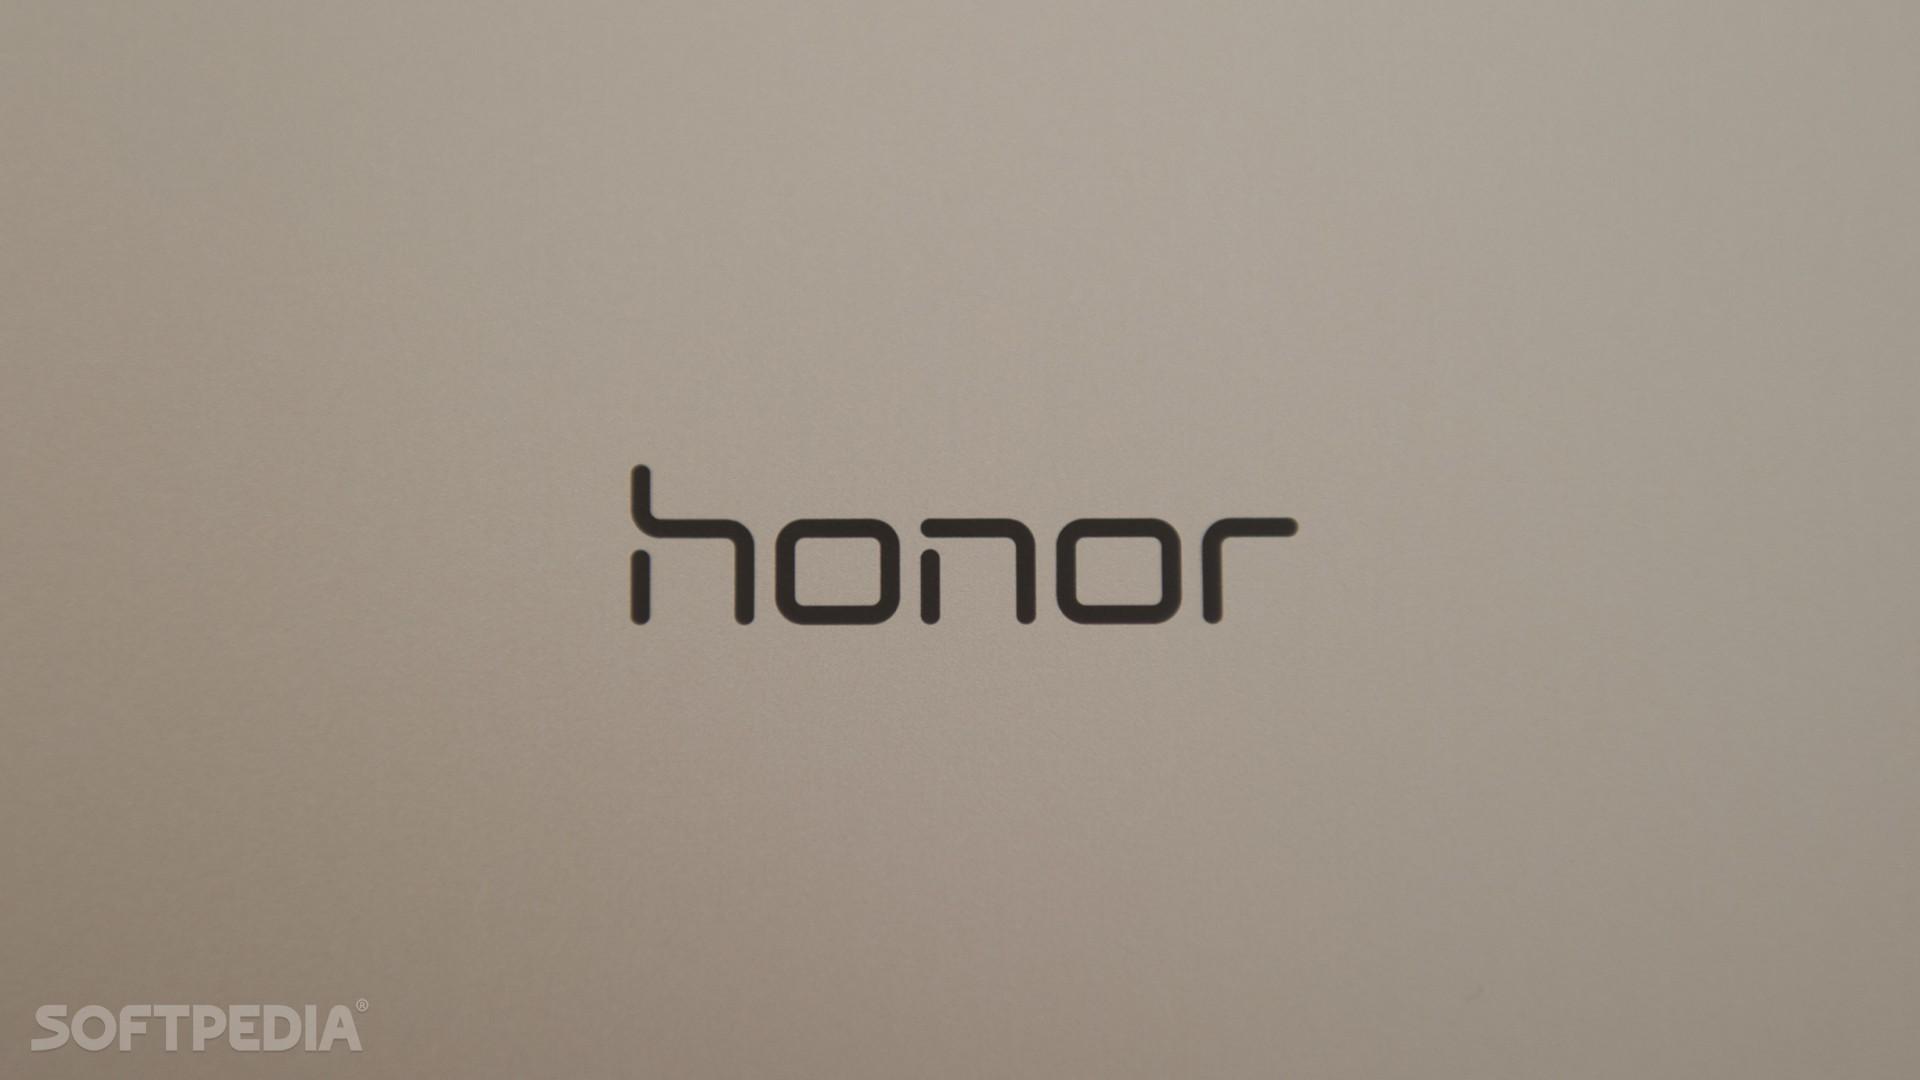 Wonderful Wallpaper Logo Huawei - huawei-honor-mediapad-x2-review-507308-9  Perfect Image Reference_553675.jpg